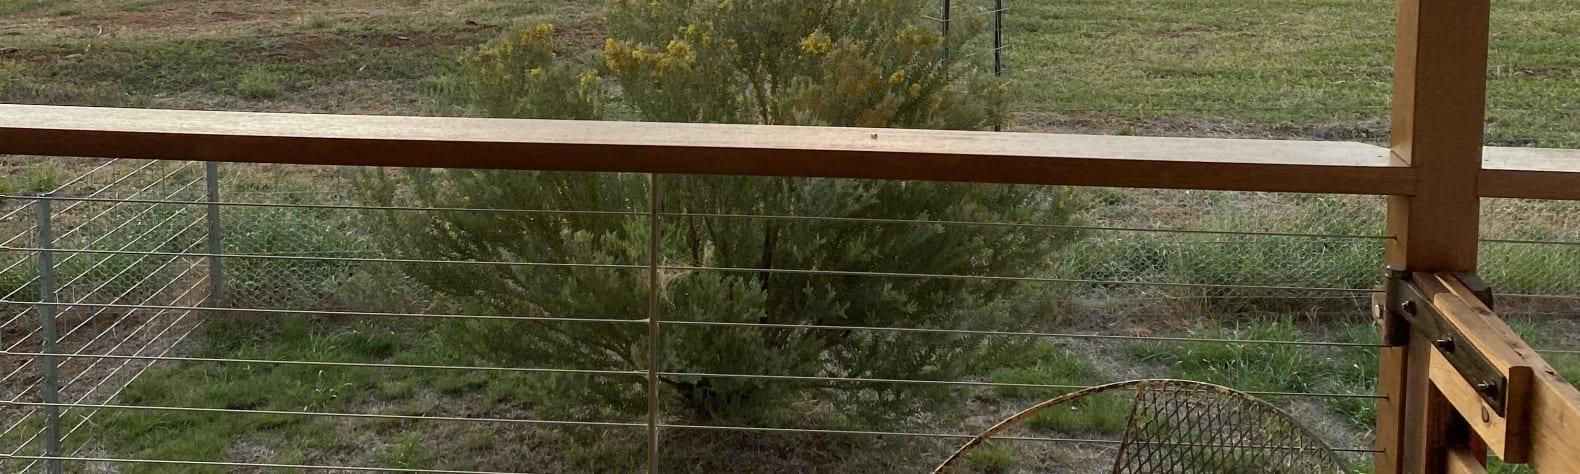 Shylah Farm, Gineroi, NSW